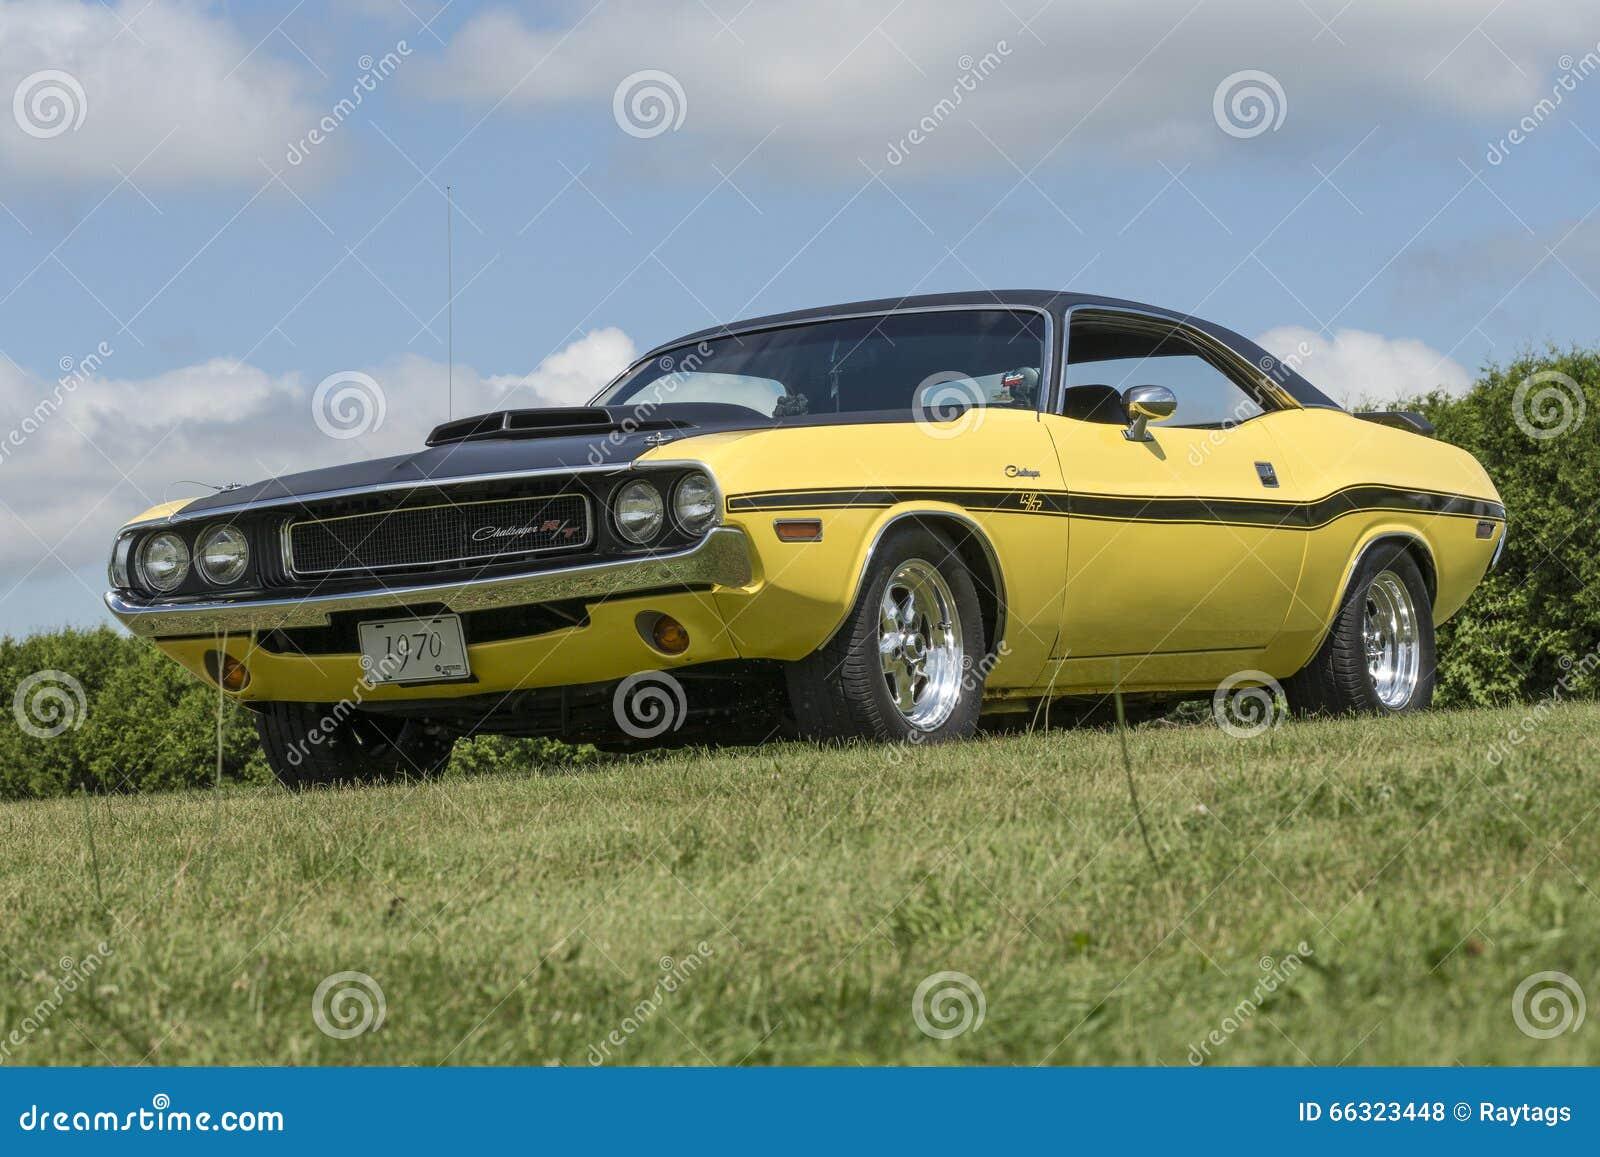 Dodge Challenger Rt Editorial Stock Photo Image 66323448